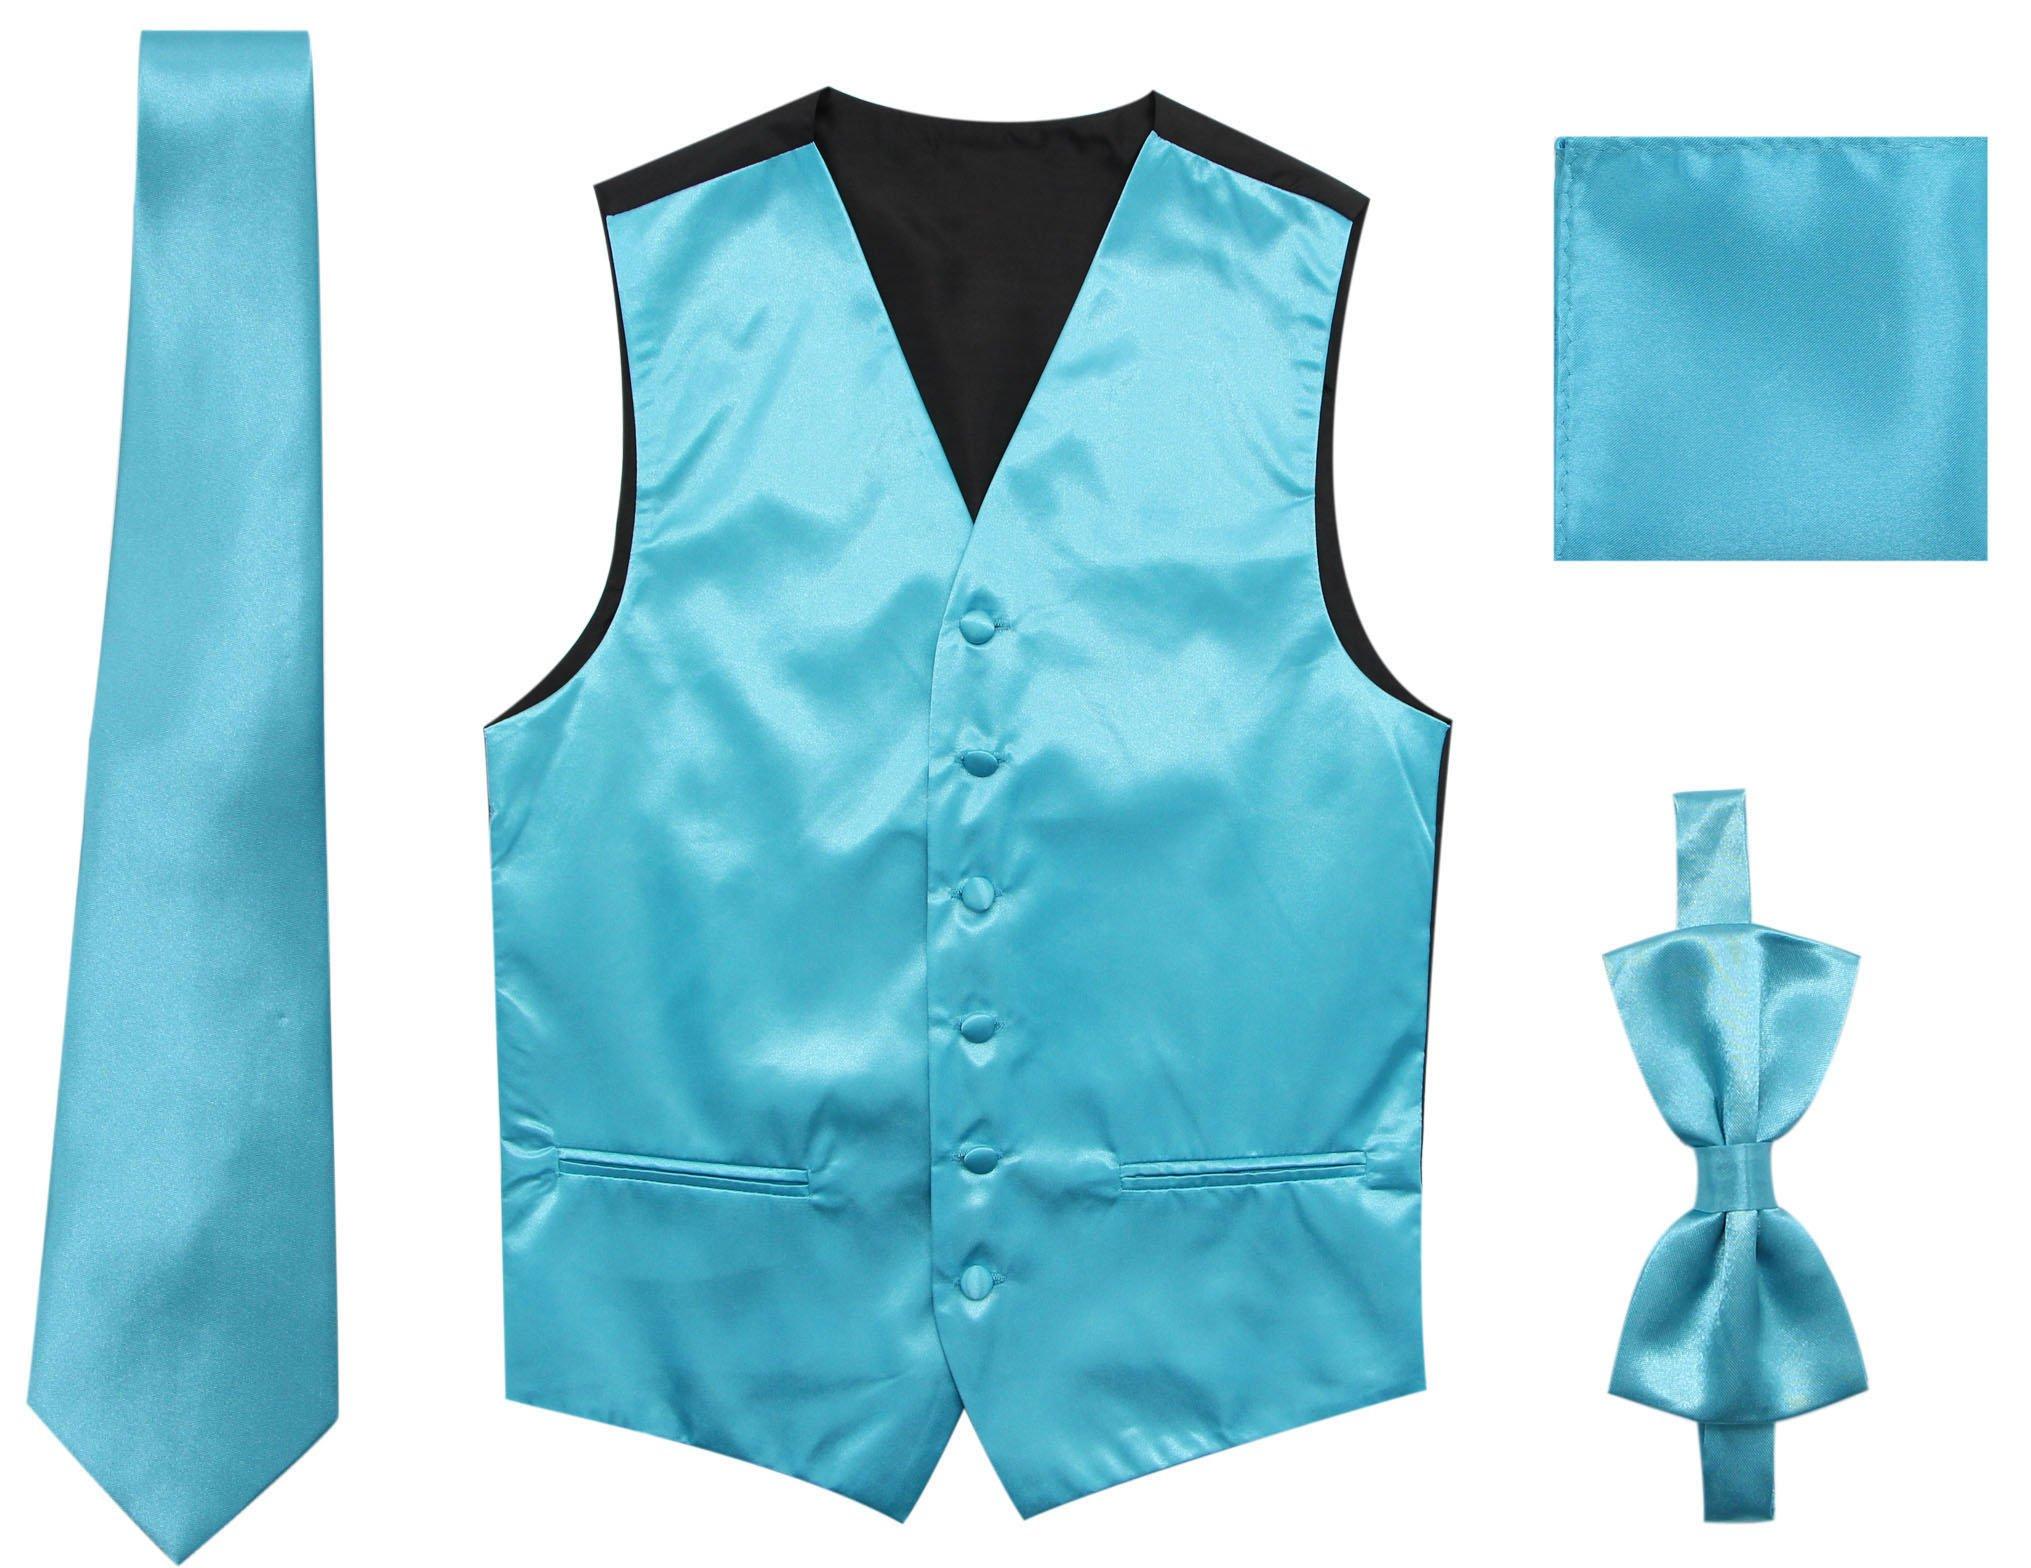 JAIFEI Satin Men Wedding Vest – Set with Neck Tie, Bow Tie & Handkerchief (XXL(Chest 48), Turquoise)